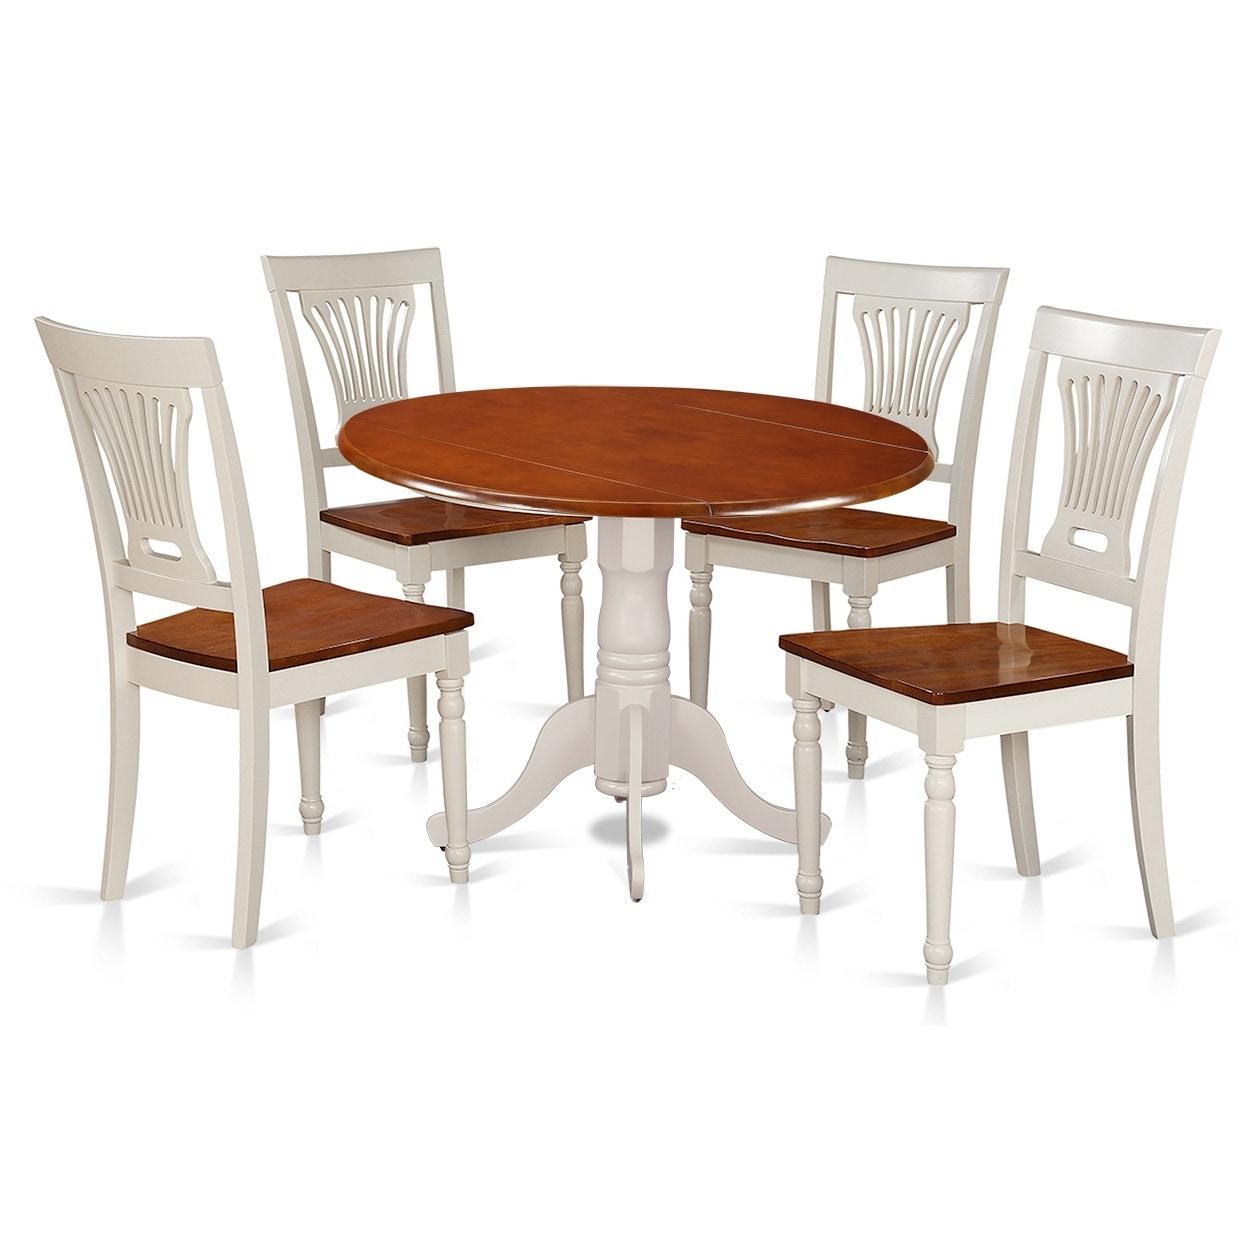 Dlpl5 Bmk 5 Pc Kitchen Set Dining Table